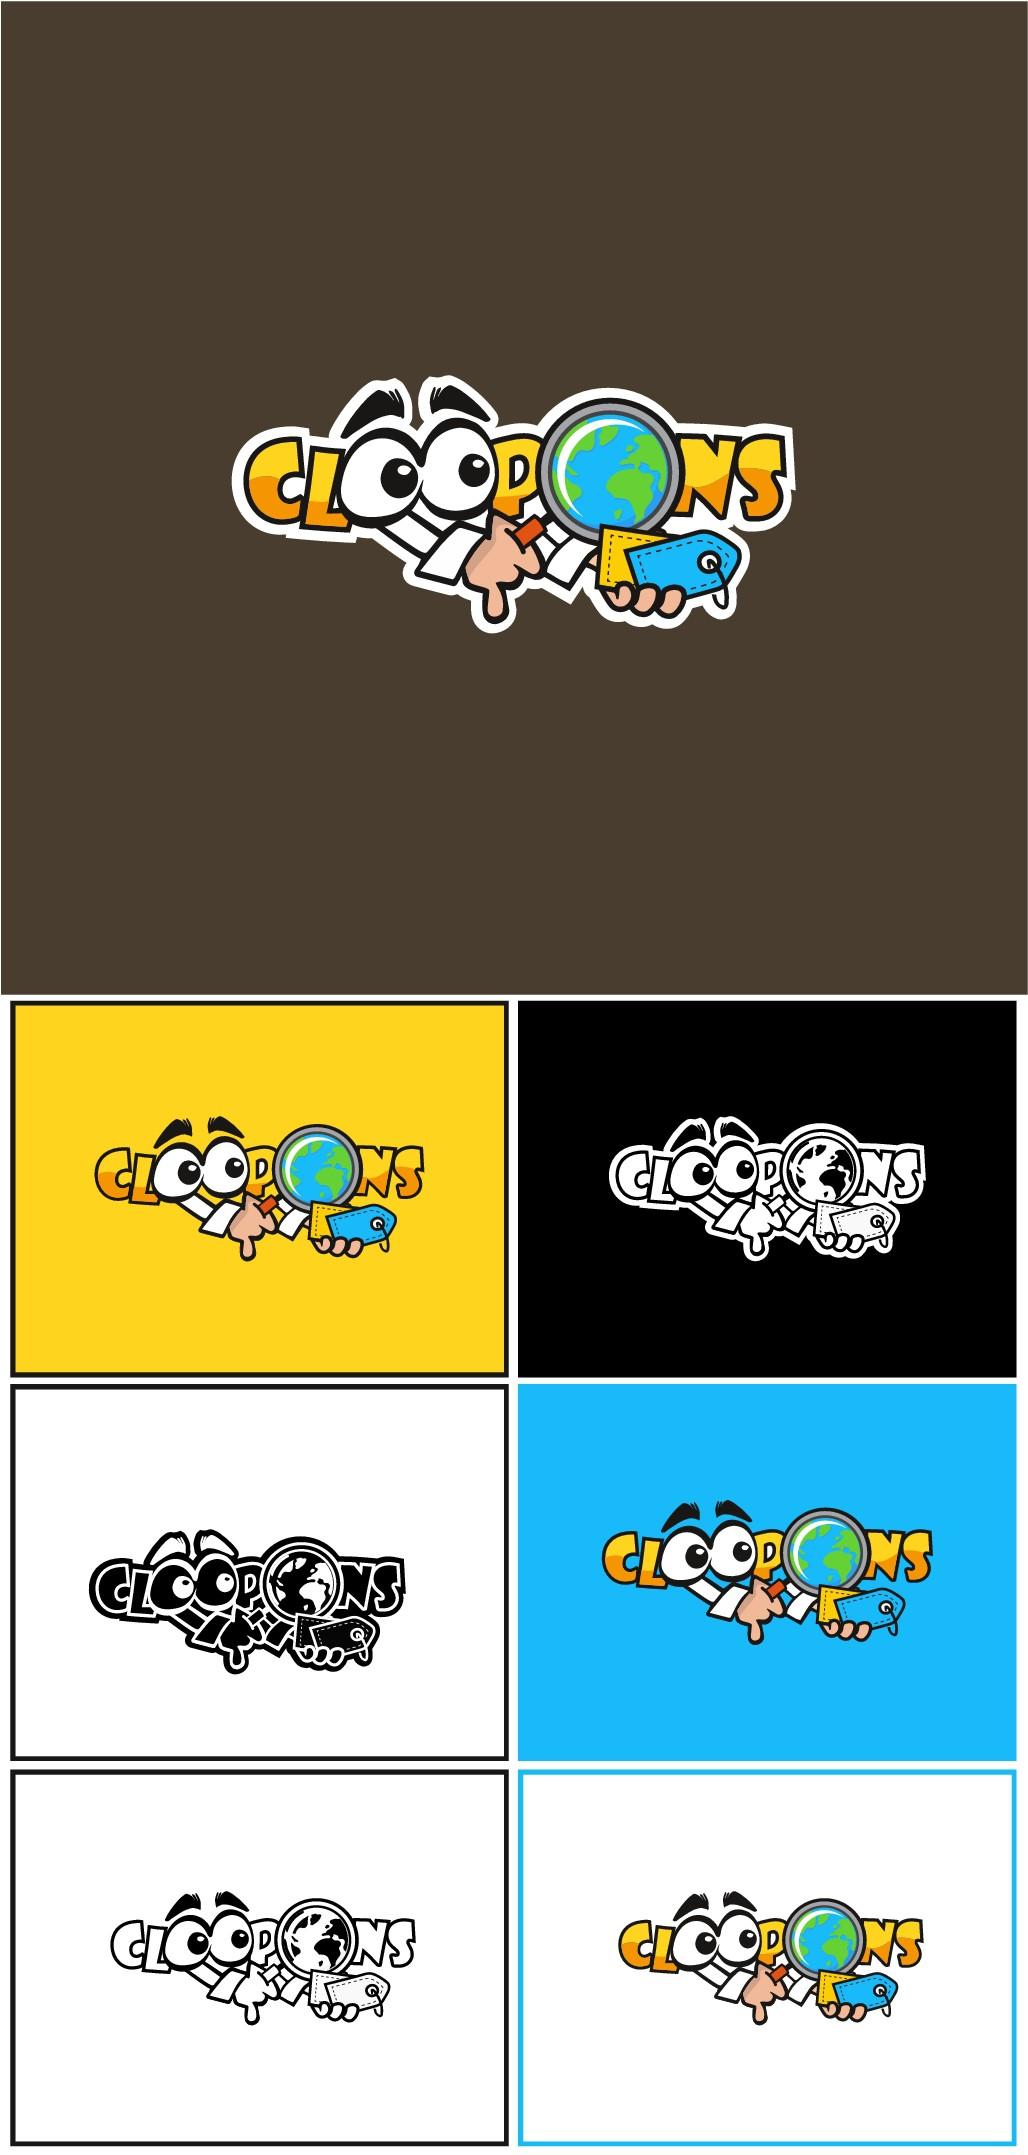 Create a logo for a online treasure hunt!  We hide CLOOPONS!